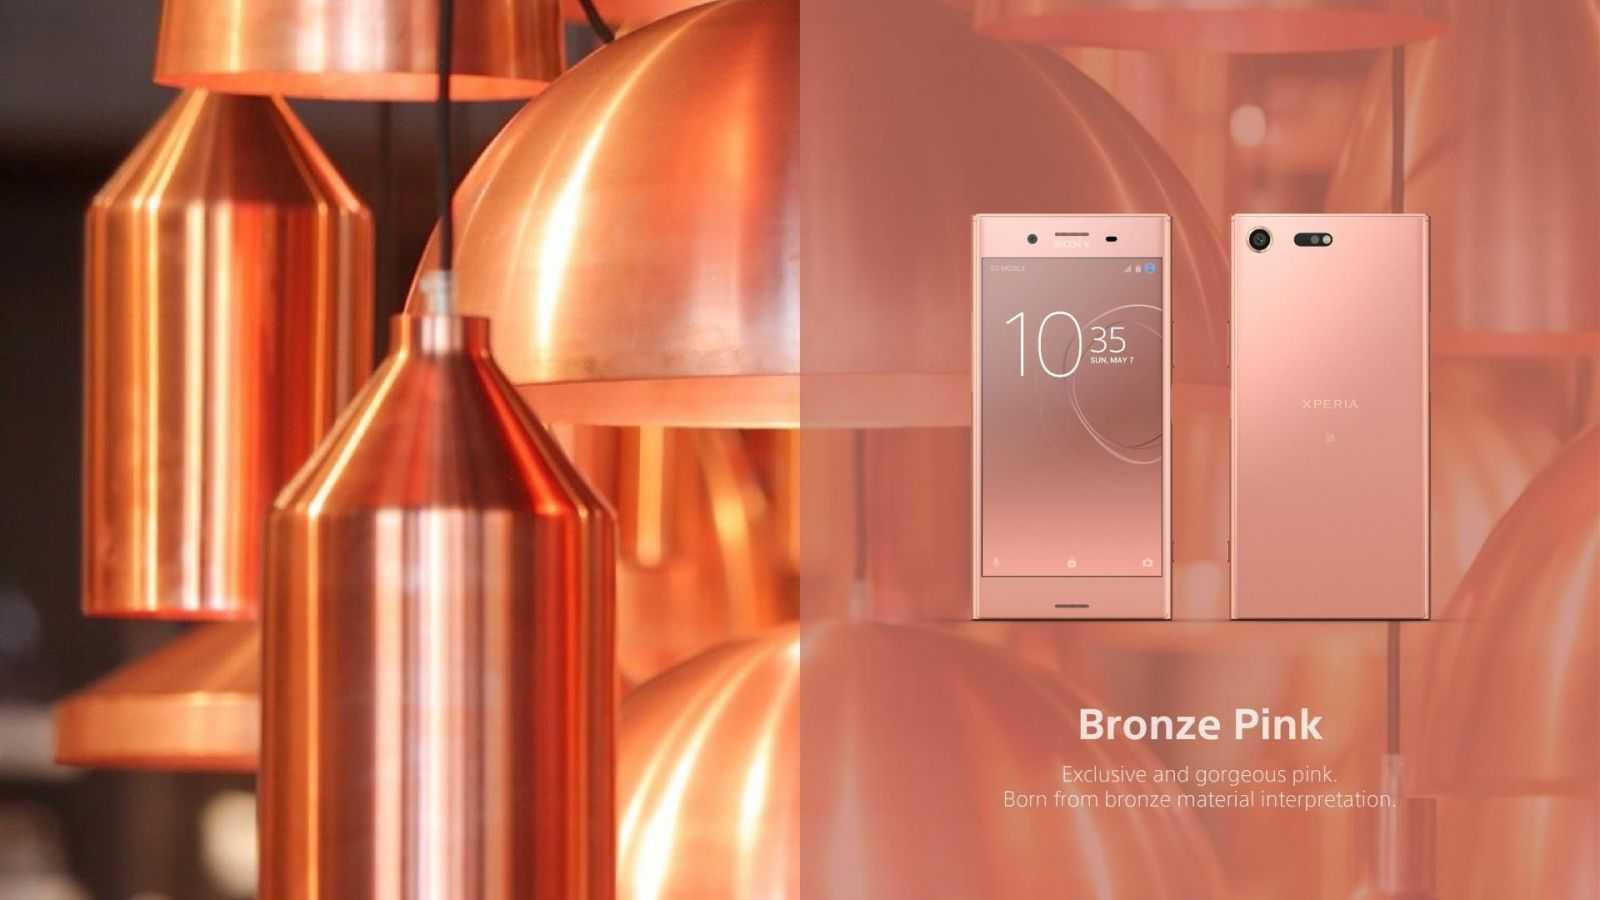 XZ Pemium Bronze Pink Colour and Material Stories 1 - IT Zine - всё о технологиях